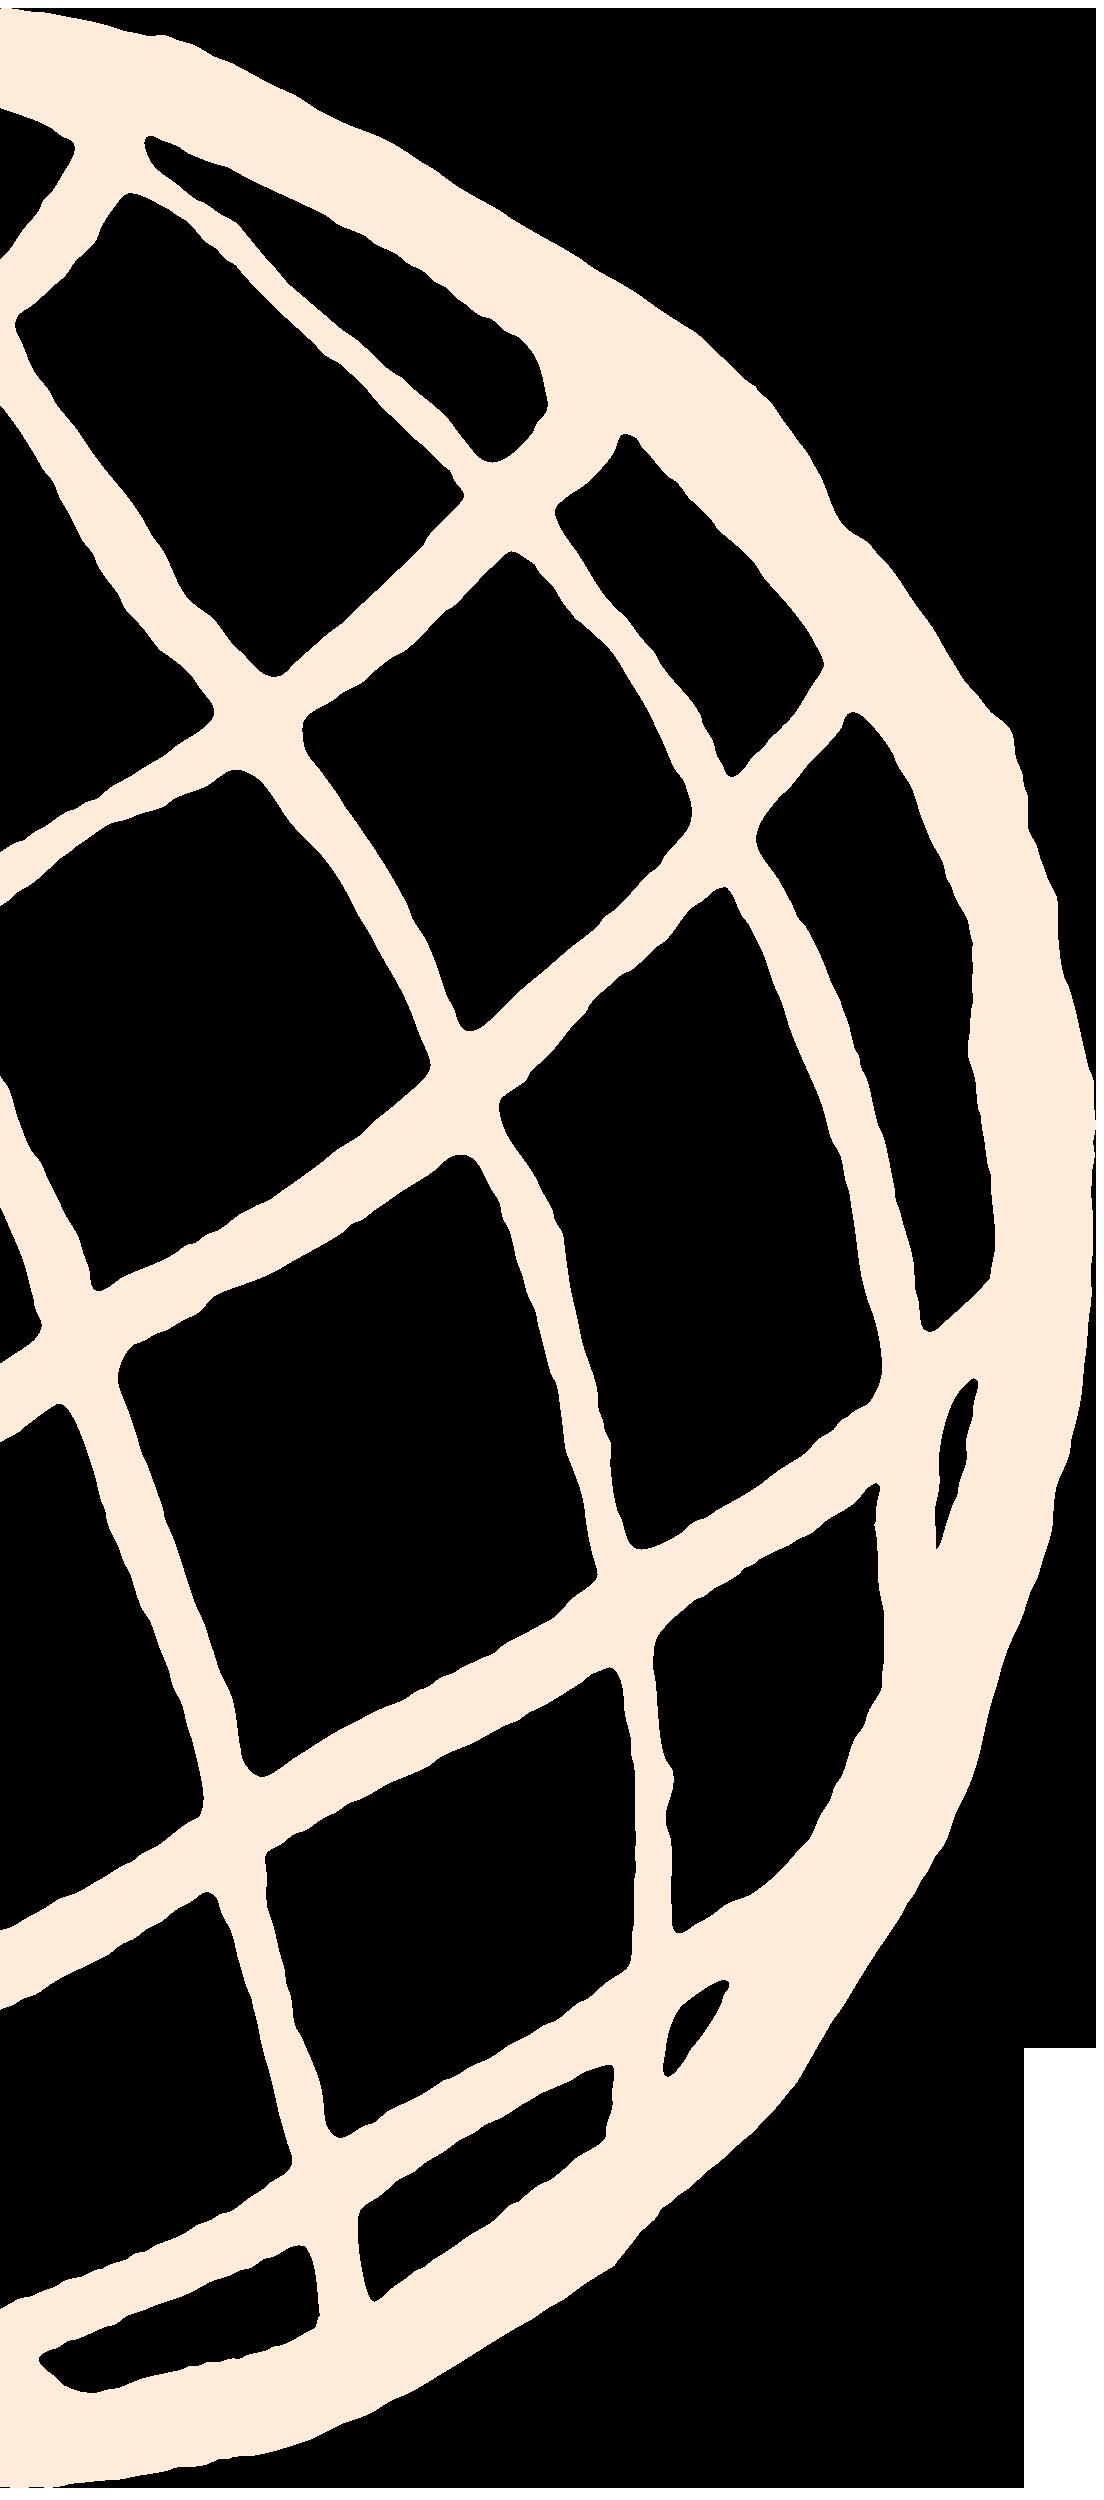 Dozent (m/w/d) - DAAD - Logo